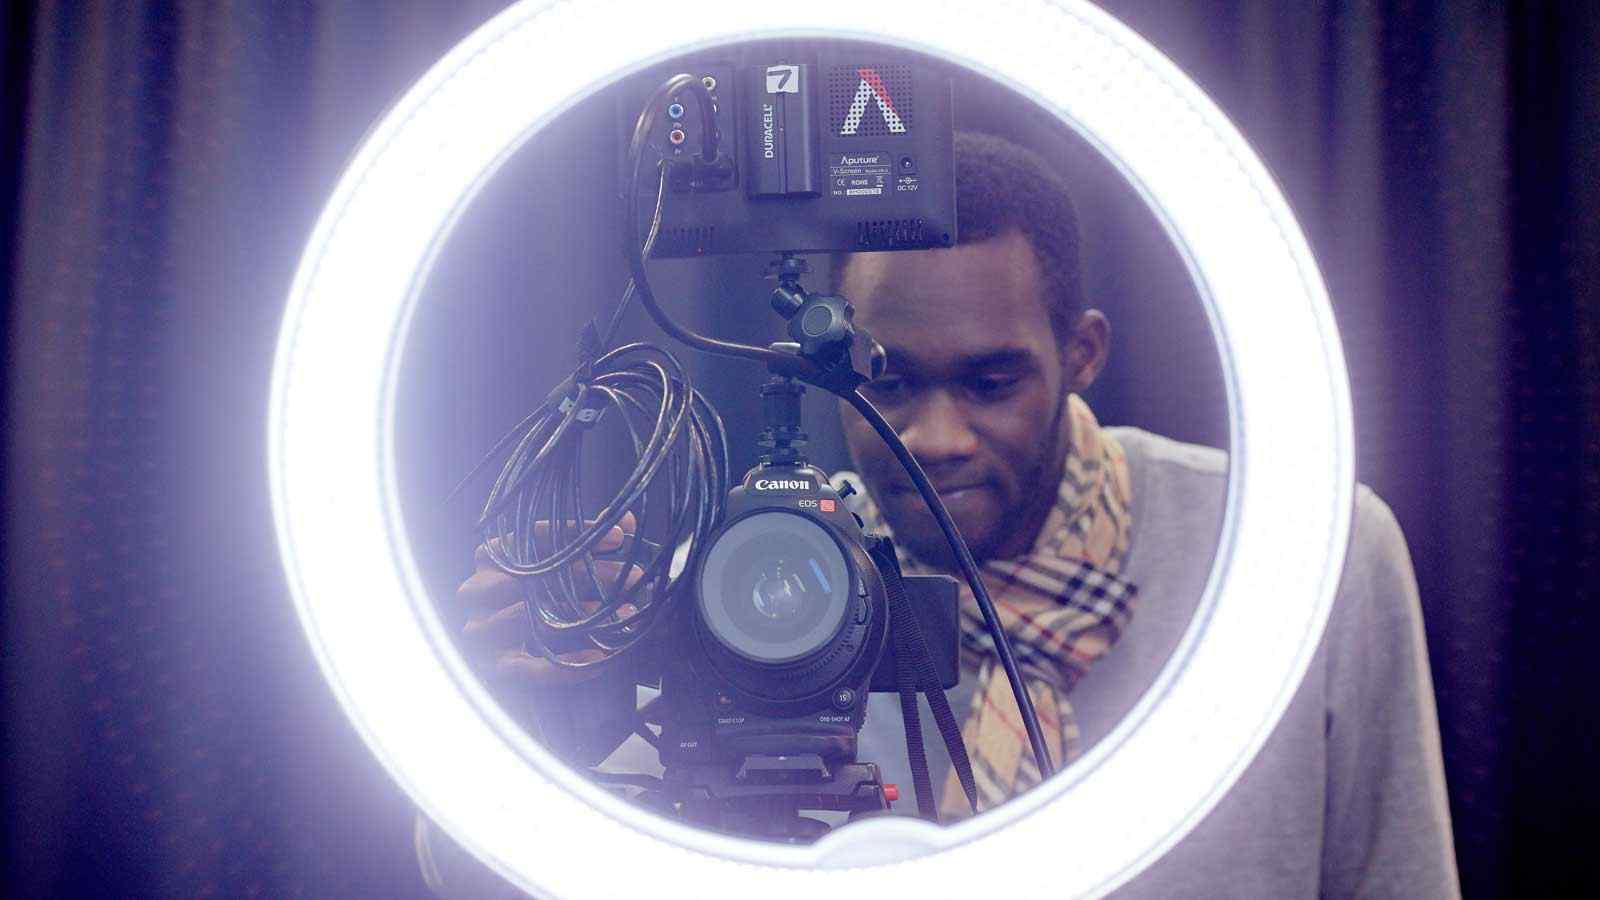 Student taking photo through ring light